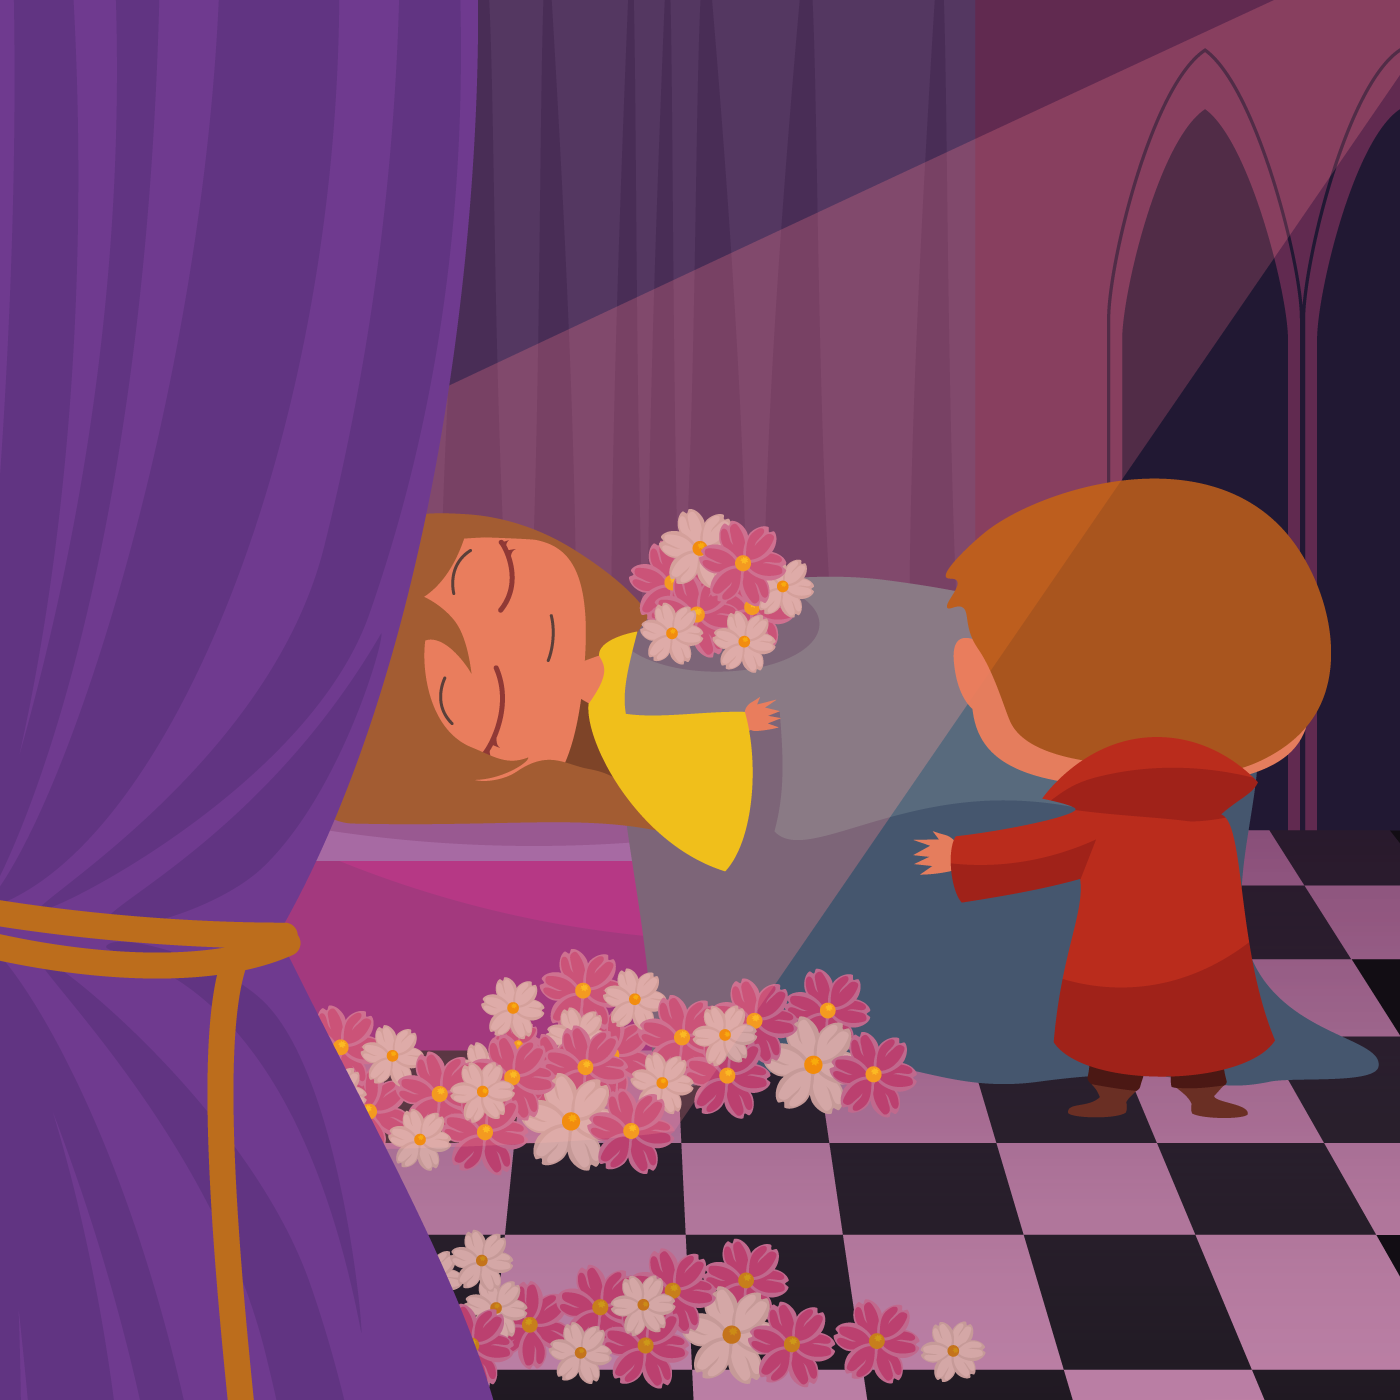 Sleeping Beauty 👸🏼- Part 2